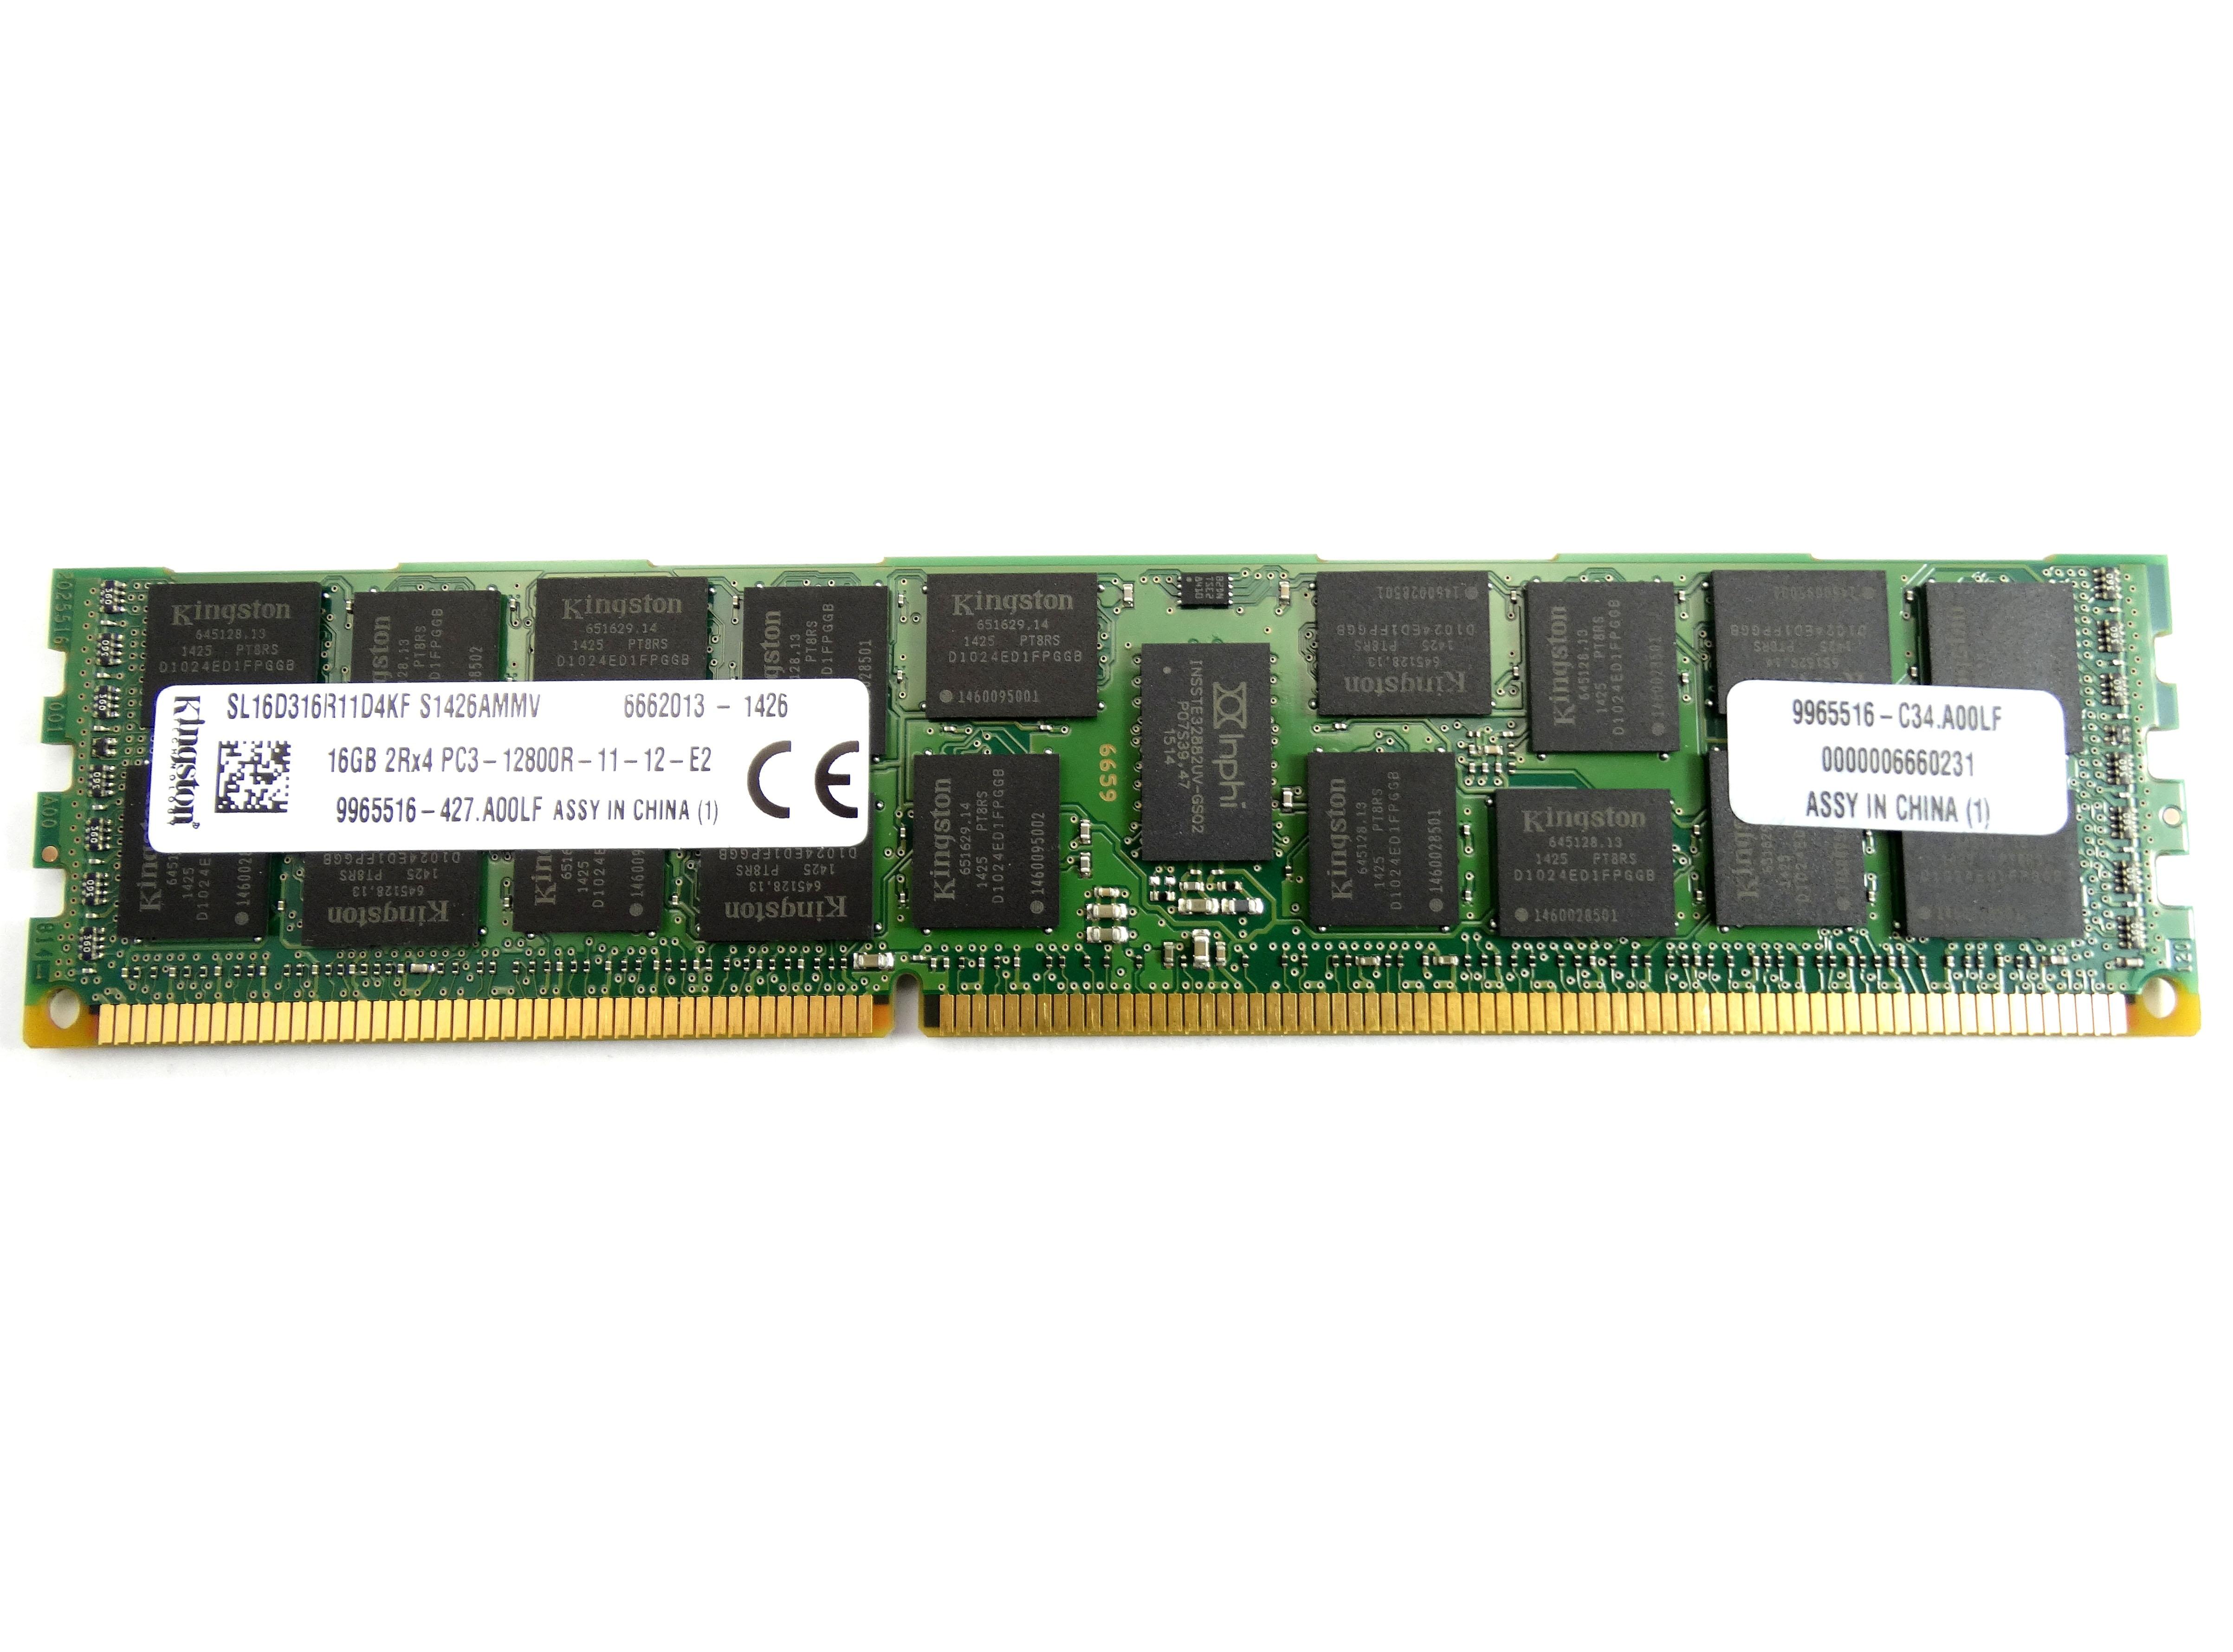 Kinston 16GB 2Rx4 PC3-12800R DDR3 1600Mhz ECC REG Memory (9965516-427.A00LF)